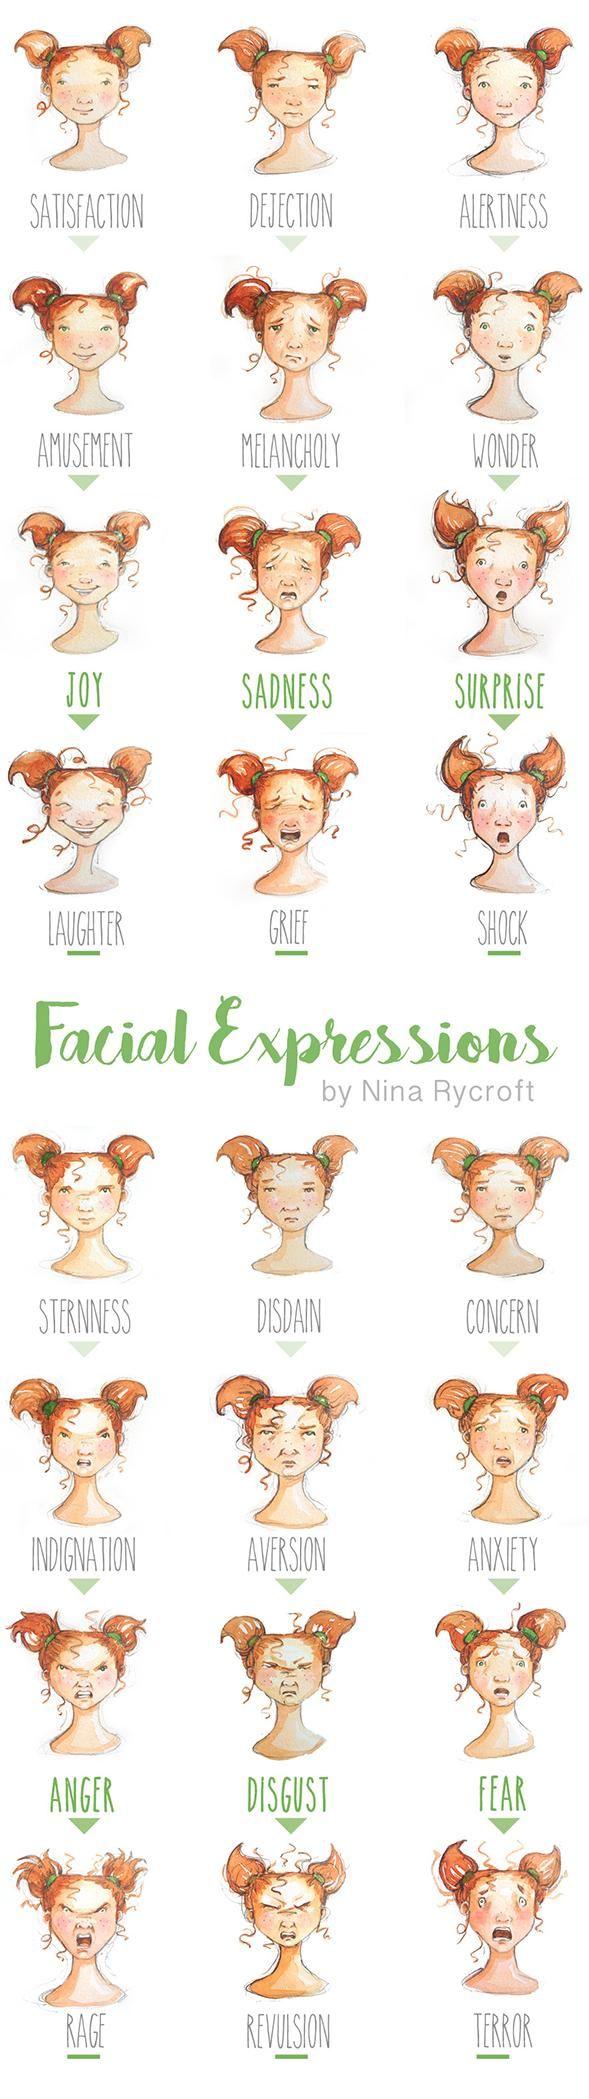 Nina's Facial Expressions Tall Pin - image 1 - student project